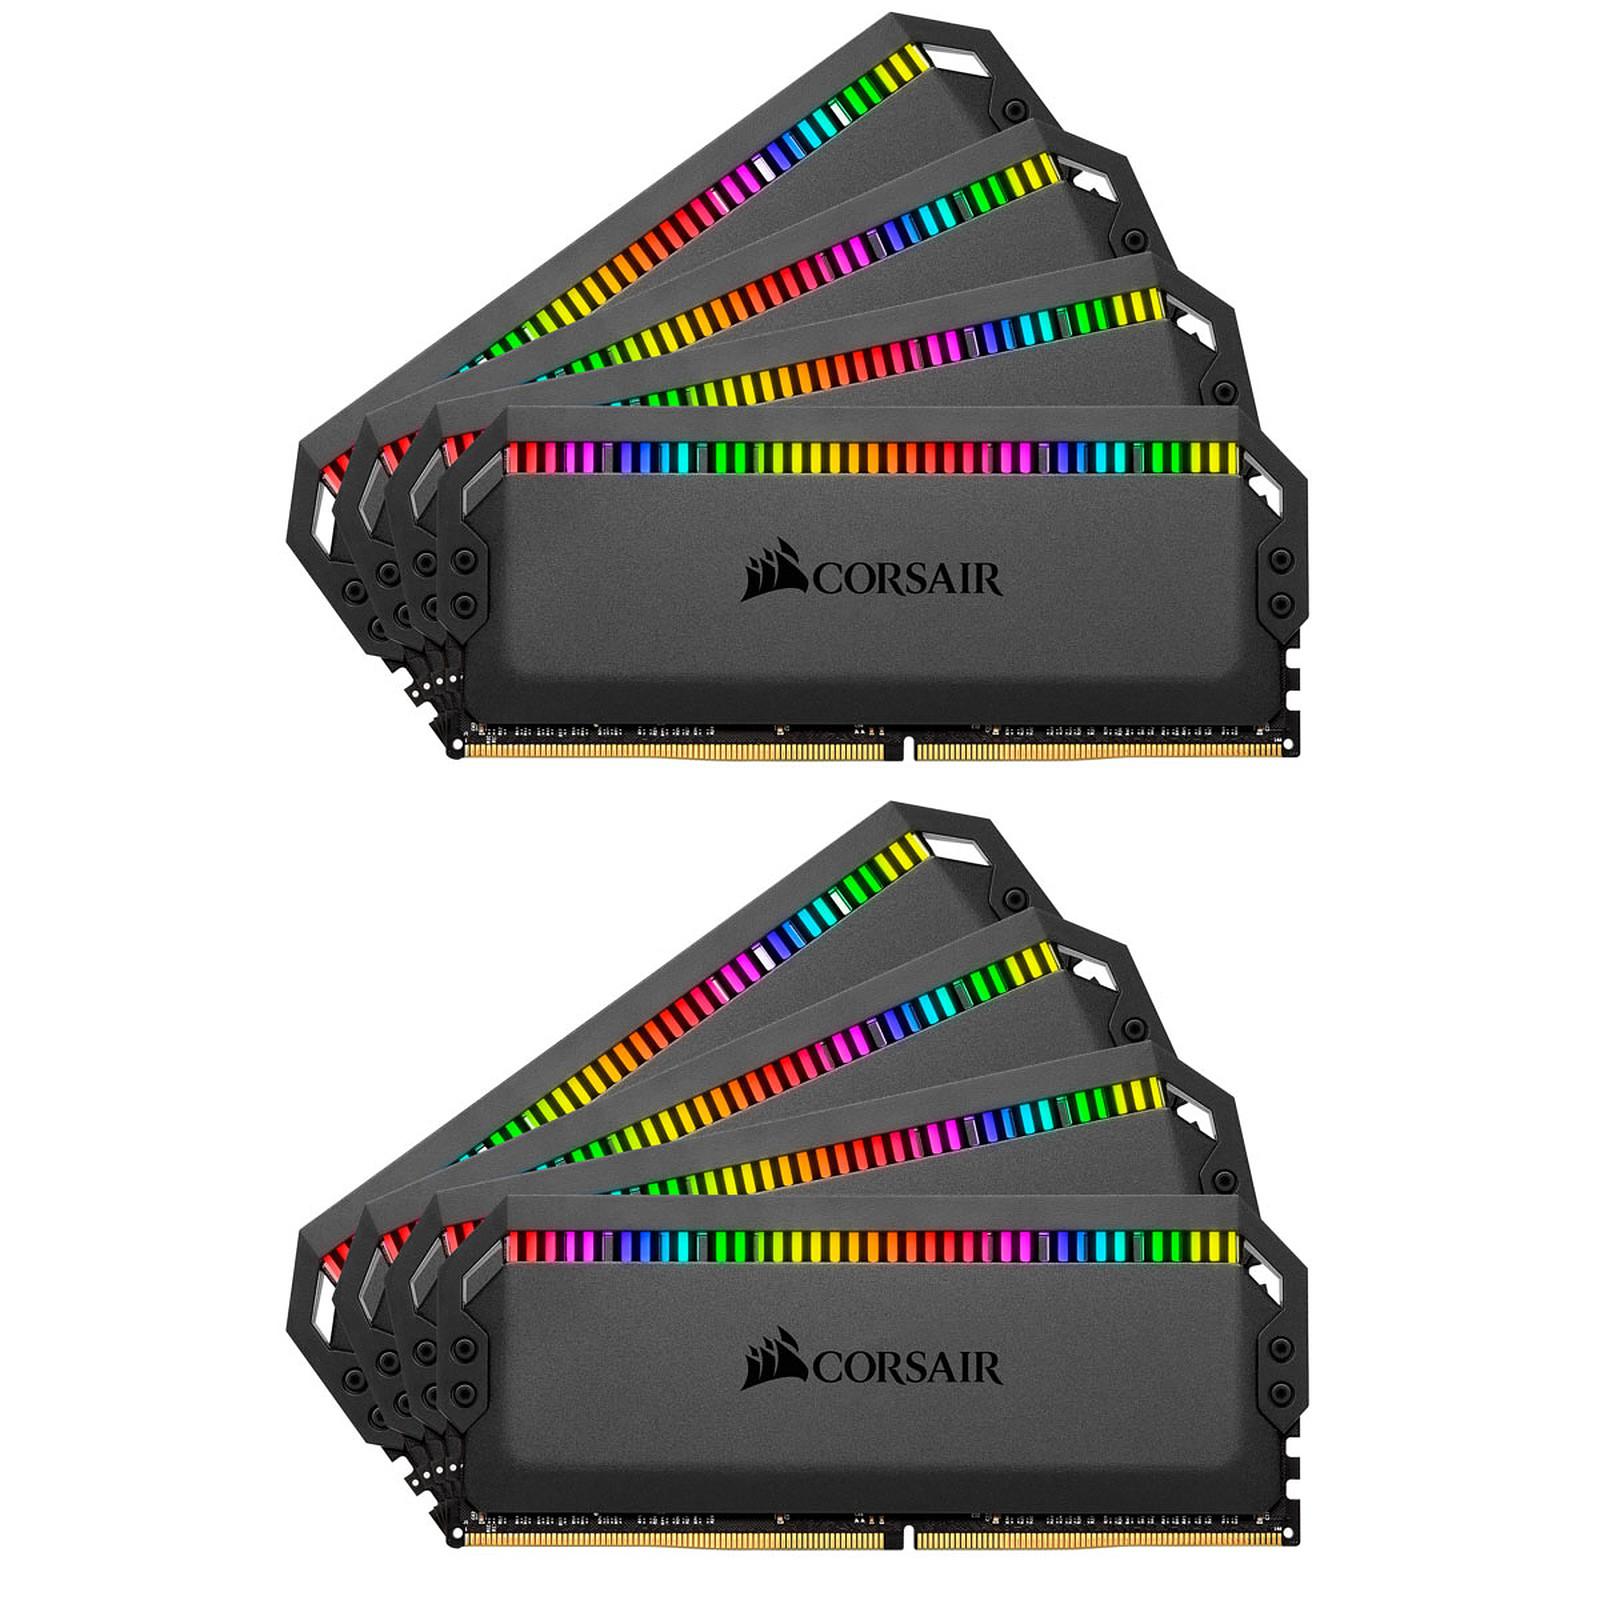 Corsair Dominator Platinum RGB 64 Go (8x 8Go) DDR4 3000 MHz CL15